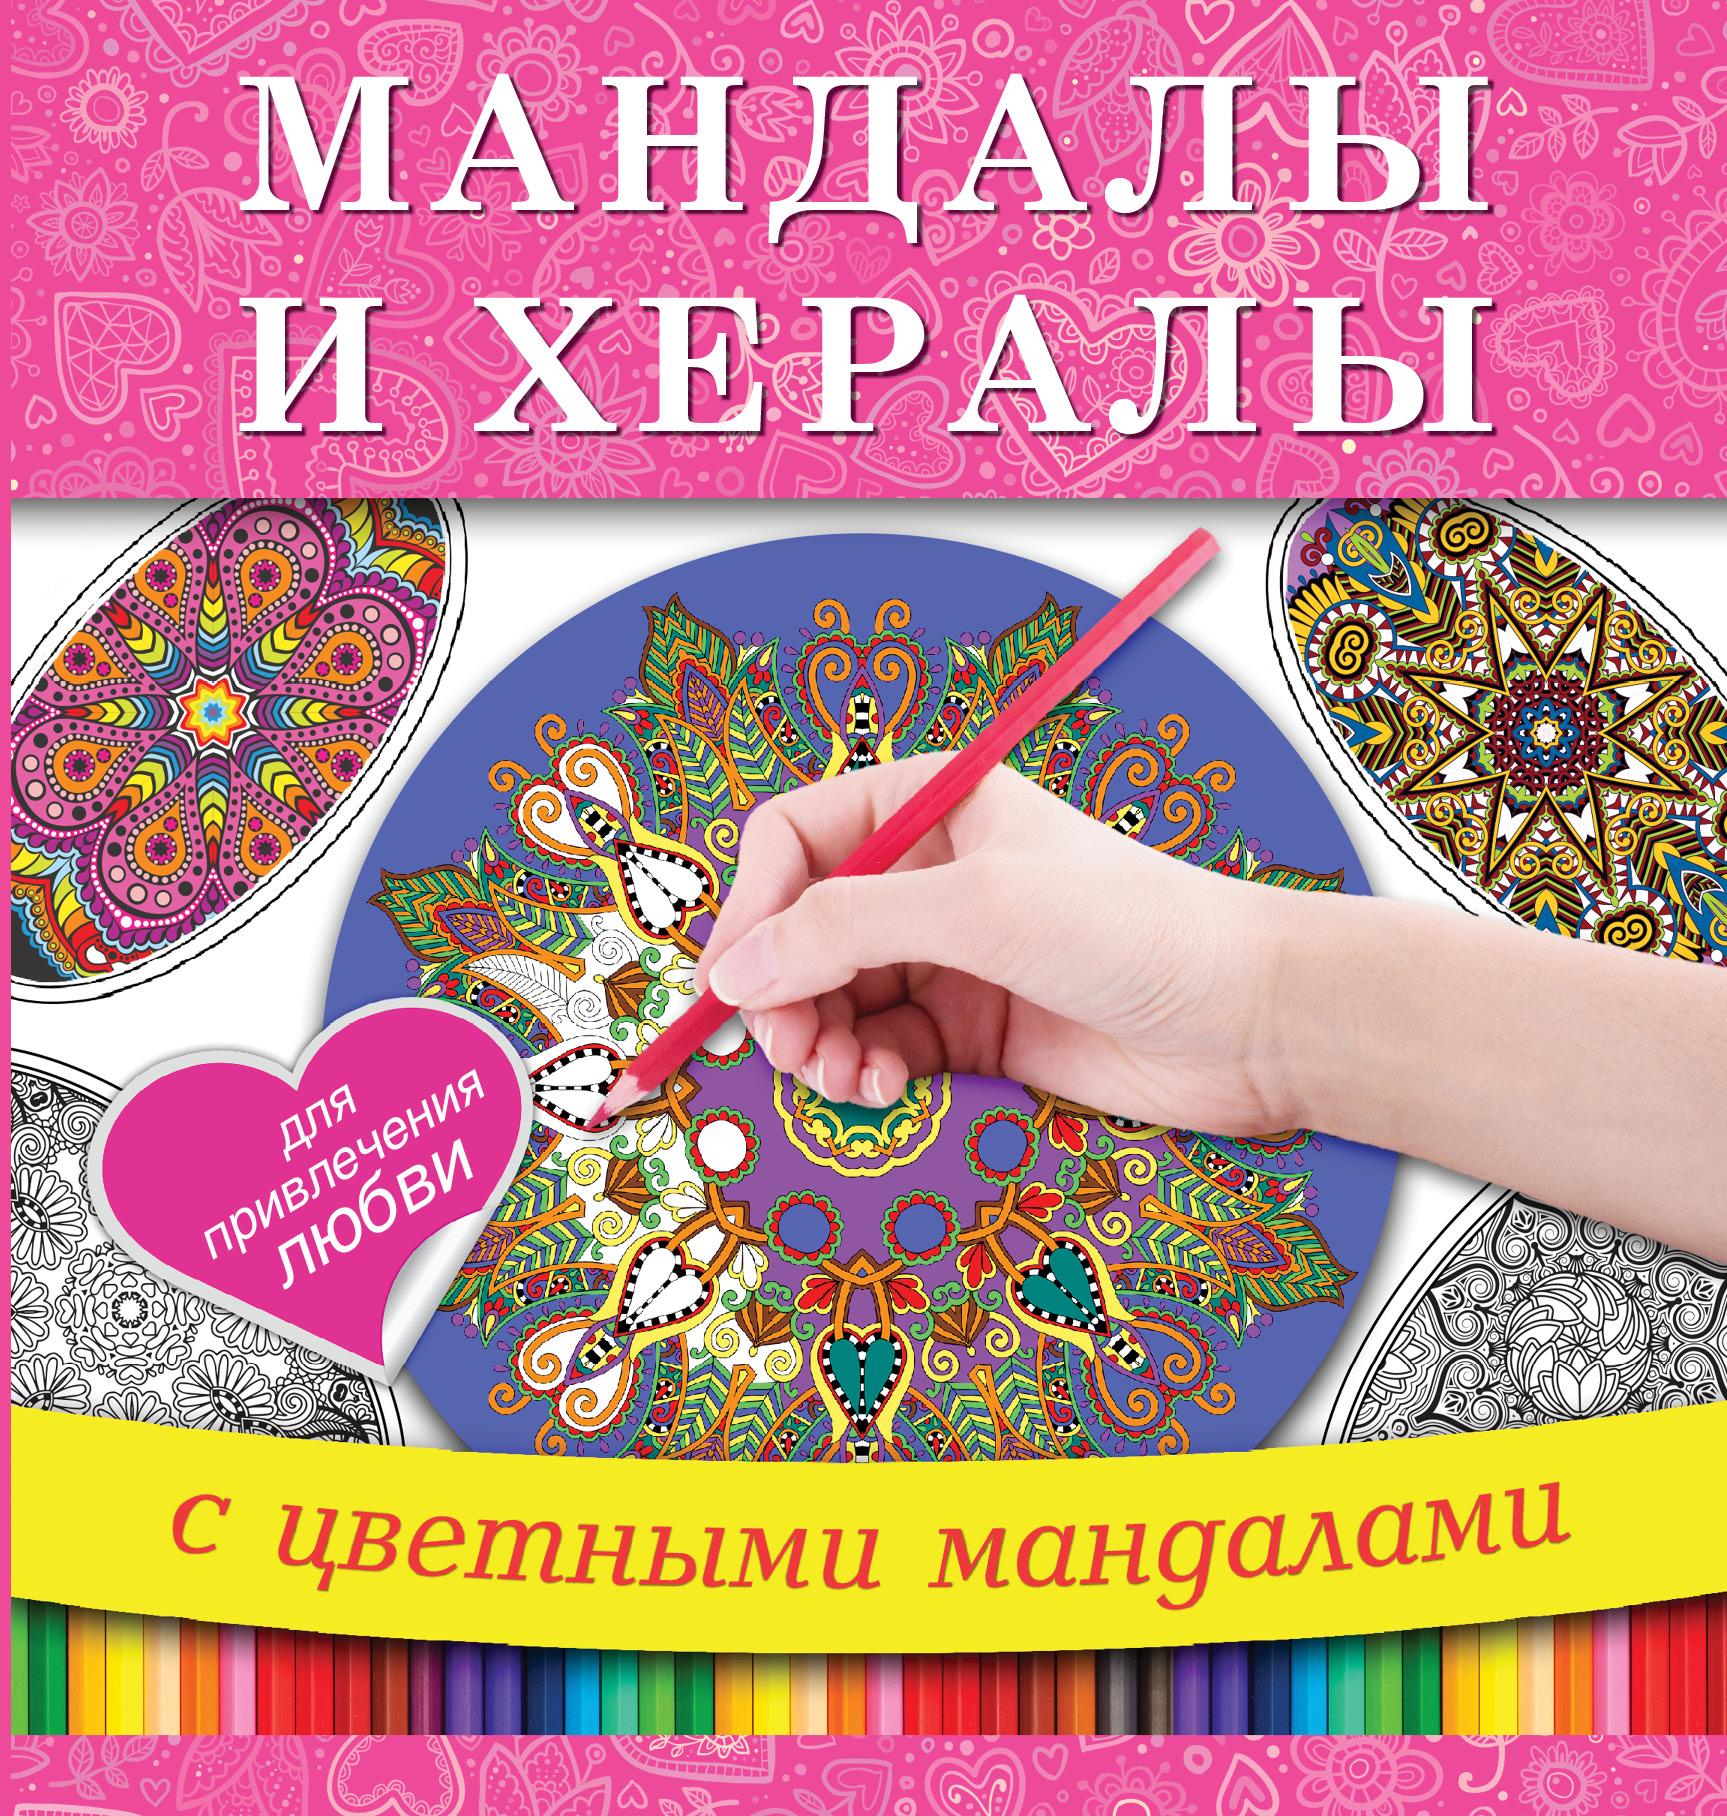 . Мандалы и хералы для привлечения любви мандалы с медитациями любовь